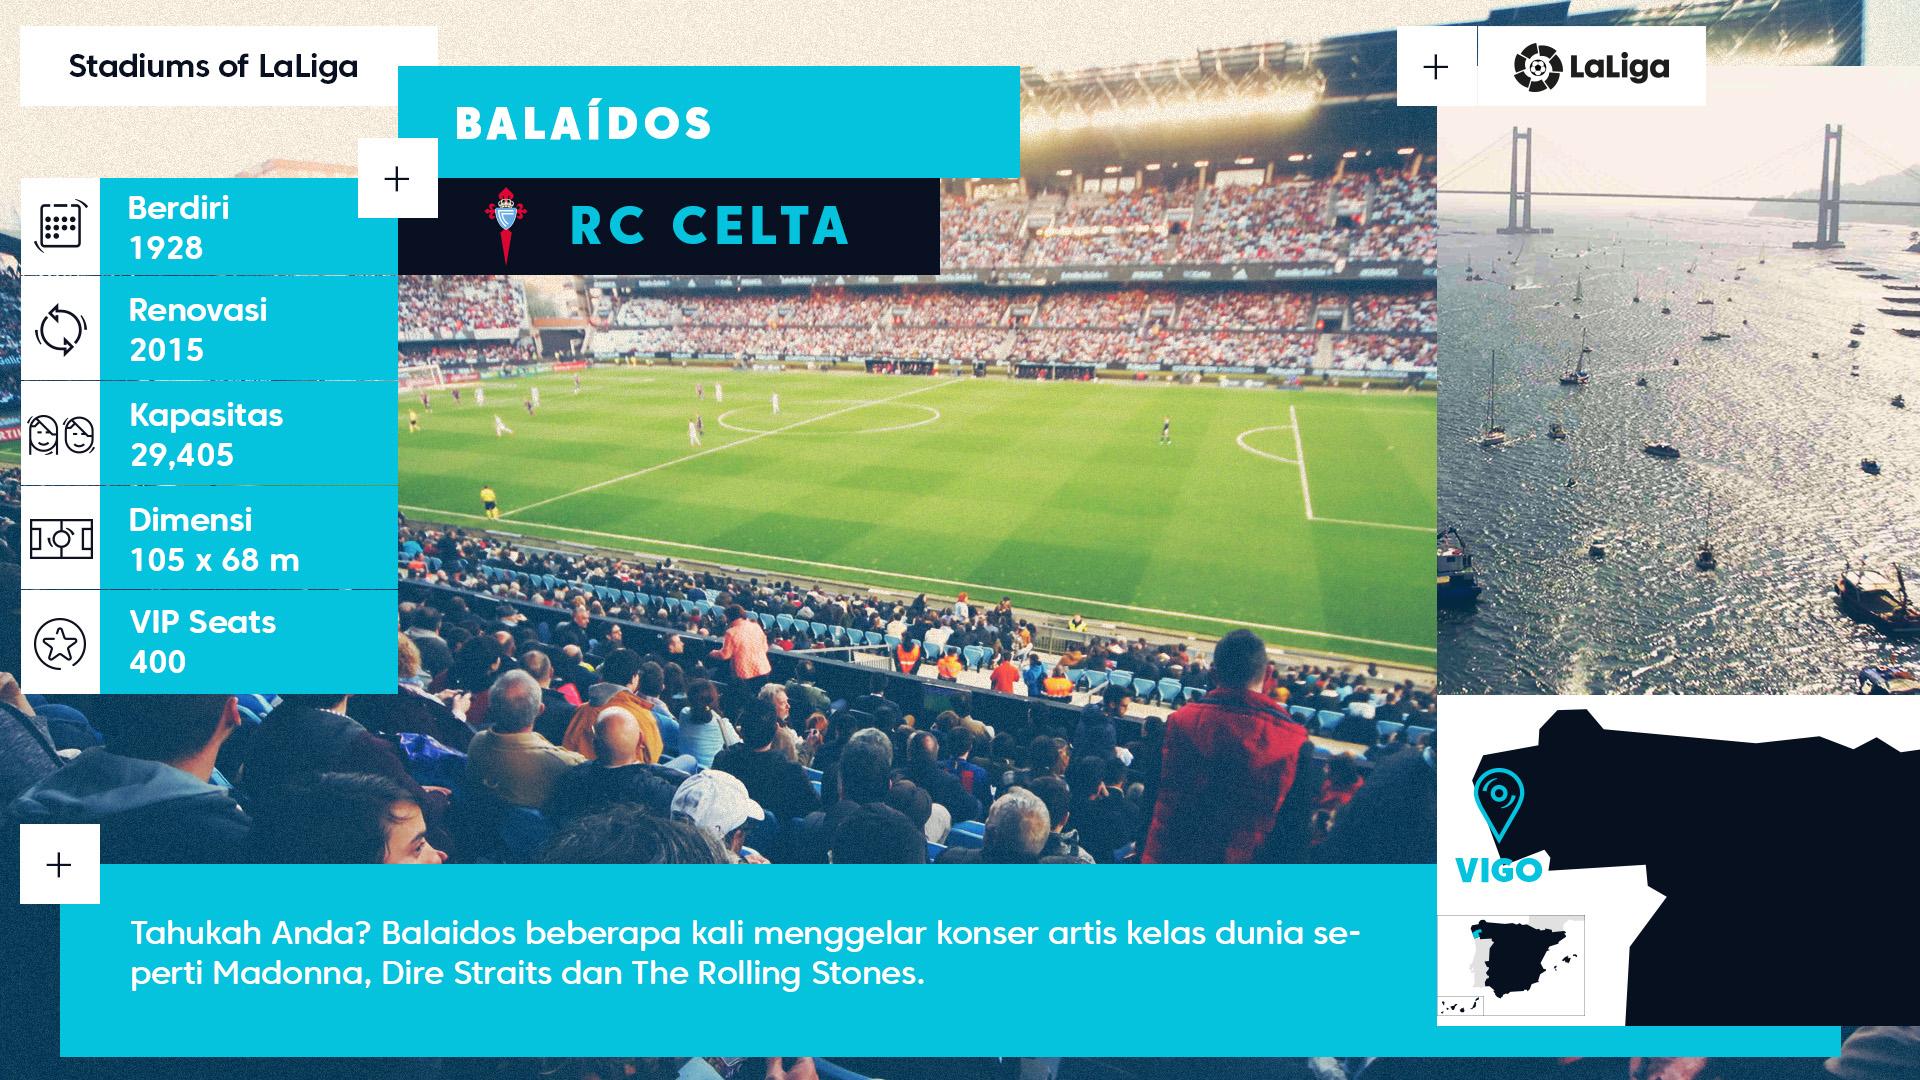 Infografis Estadio Abanca Balaidos - Celta Vigo